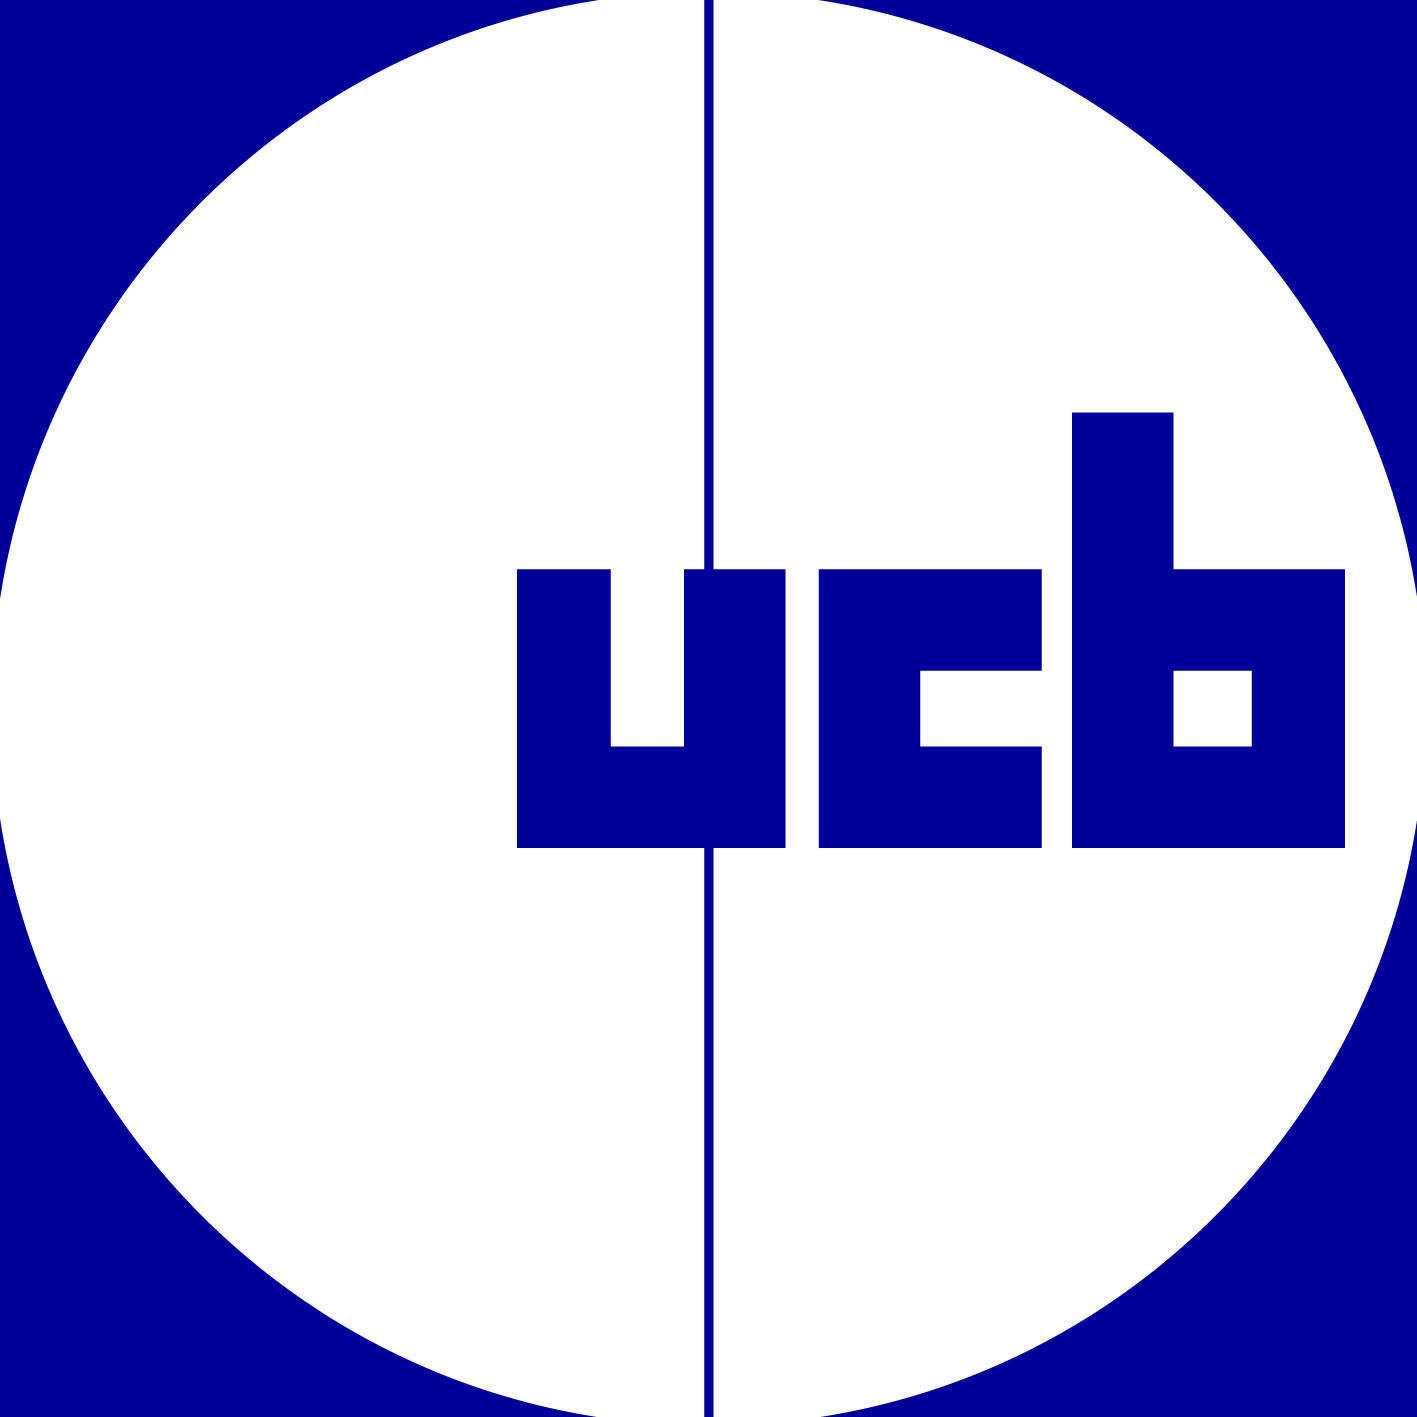 UCB Biopharma